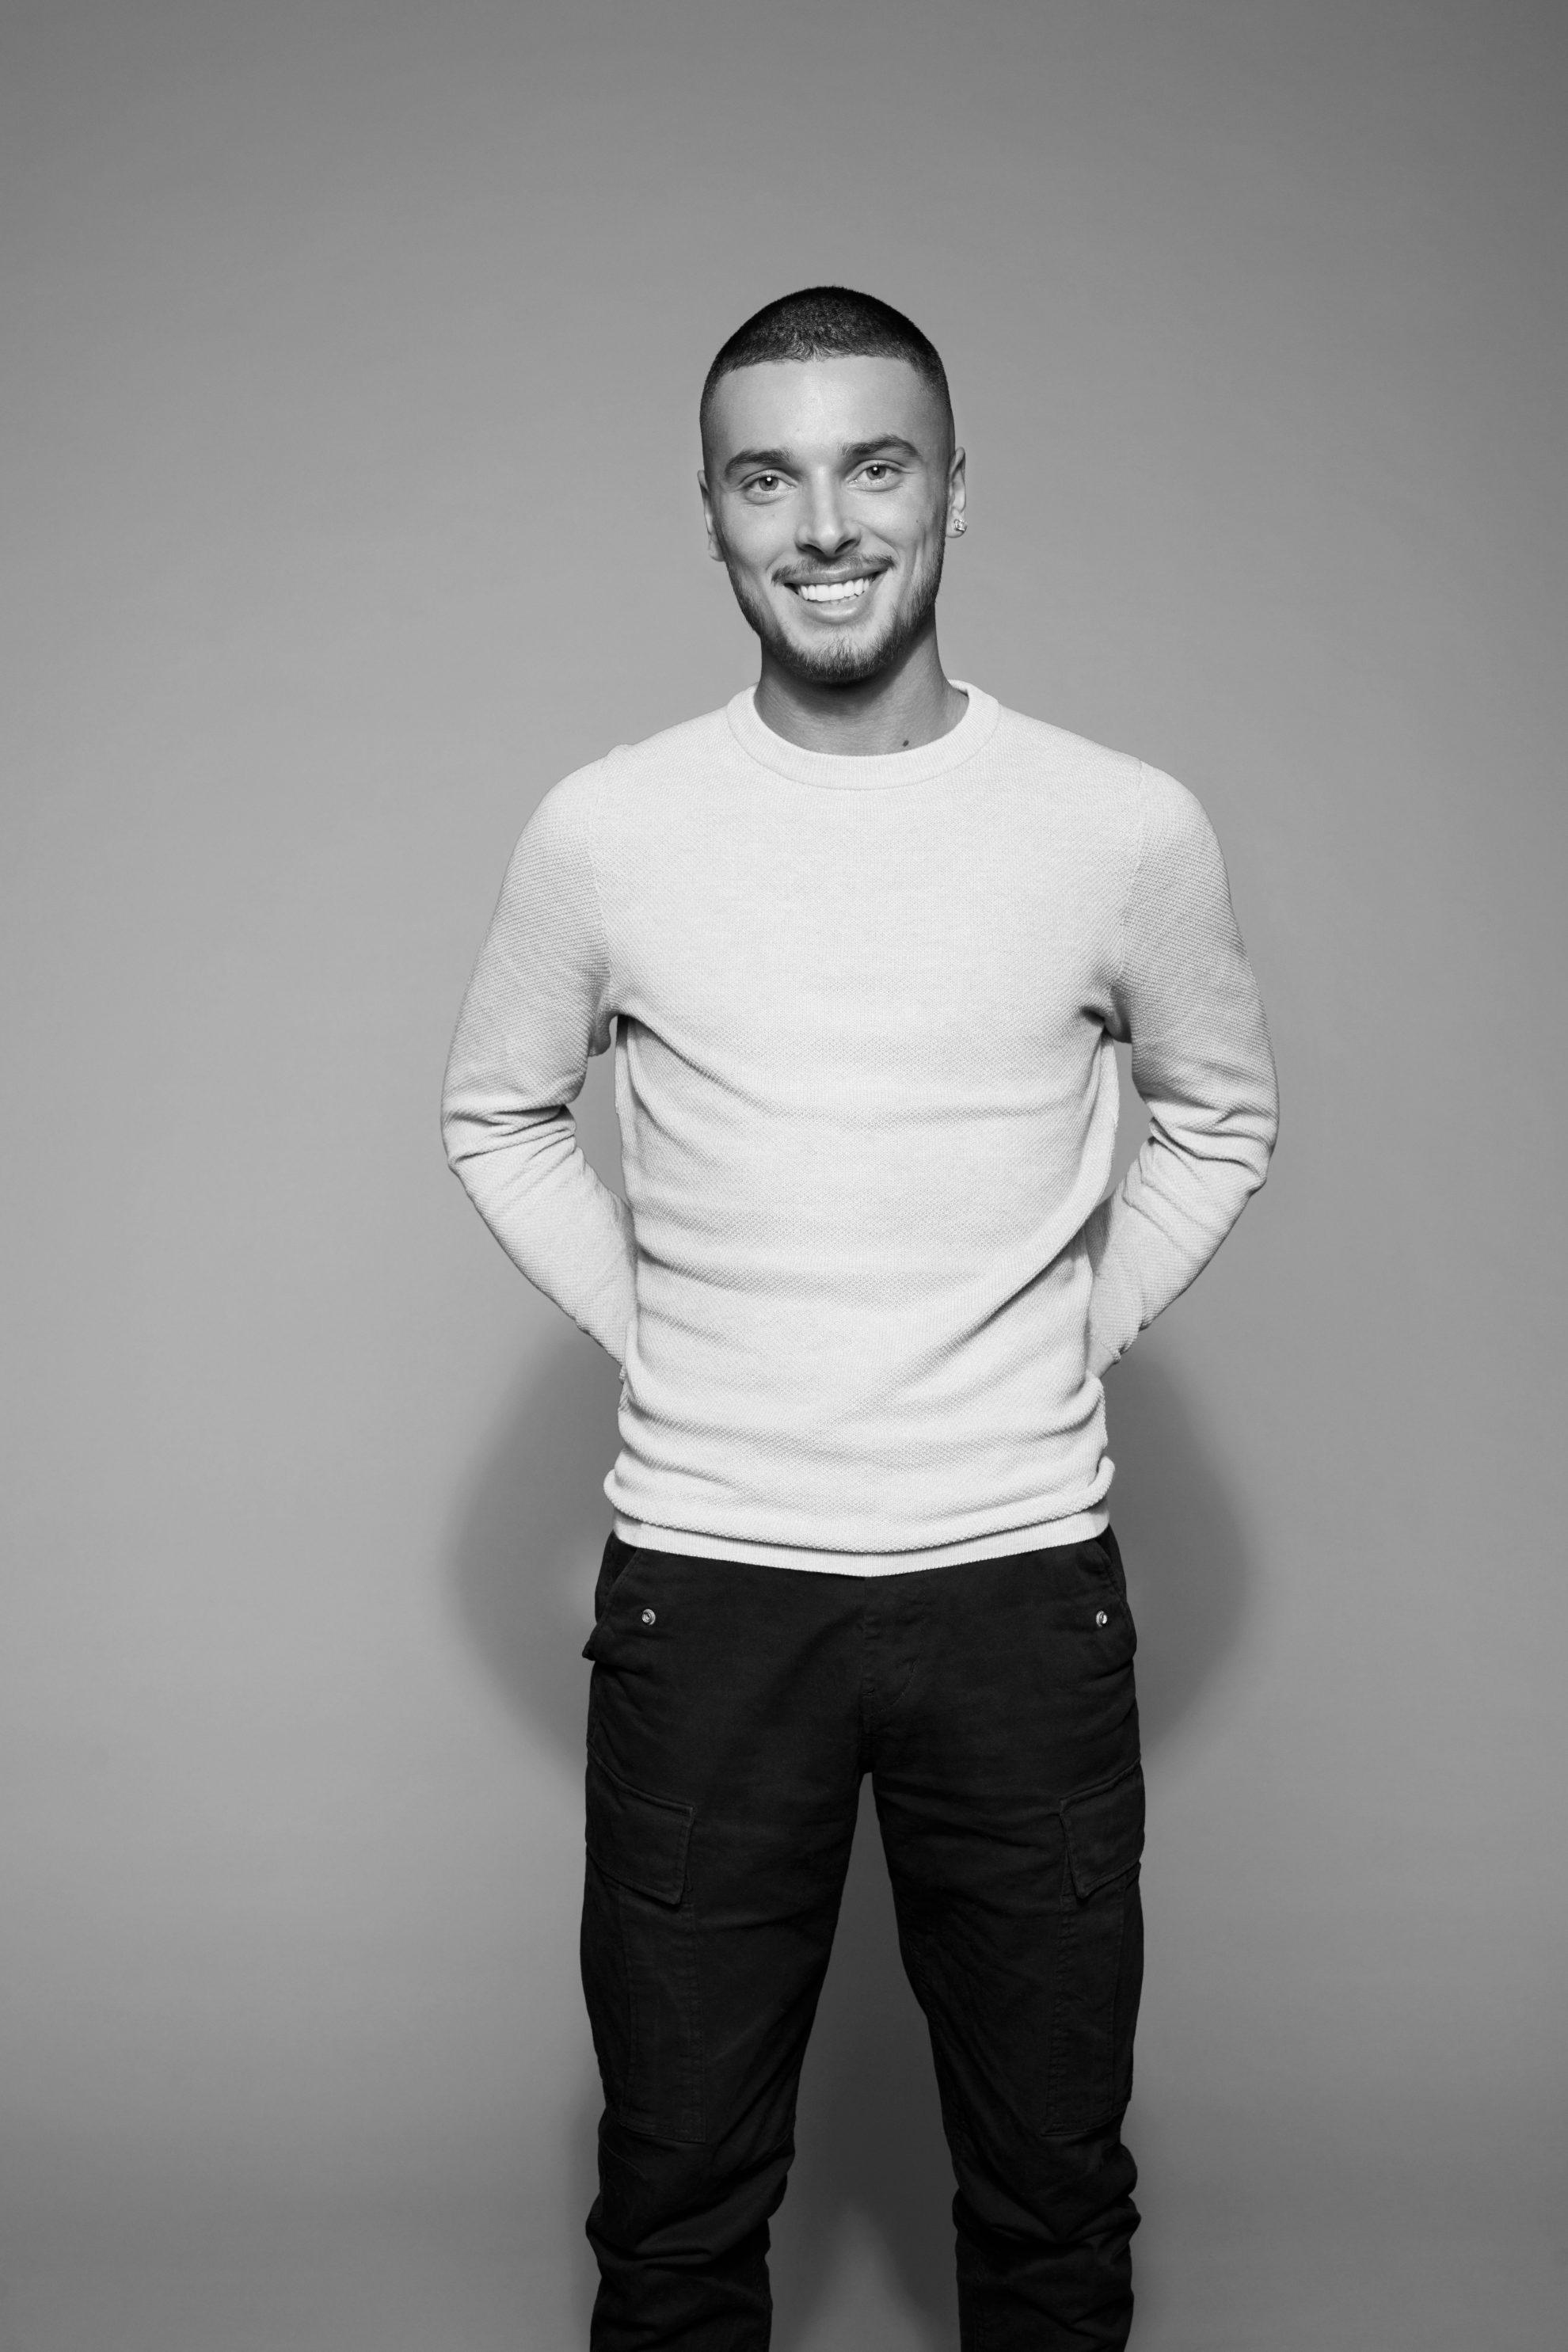 Deltagare - Big Brother Sverige 2021 - bigbrothersverige.se